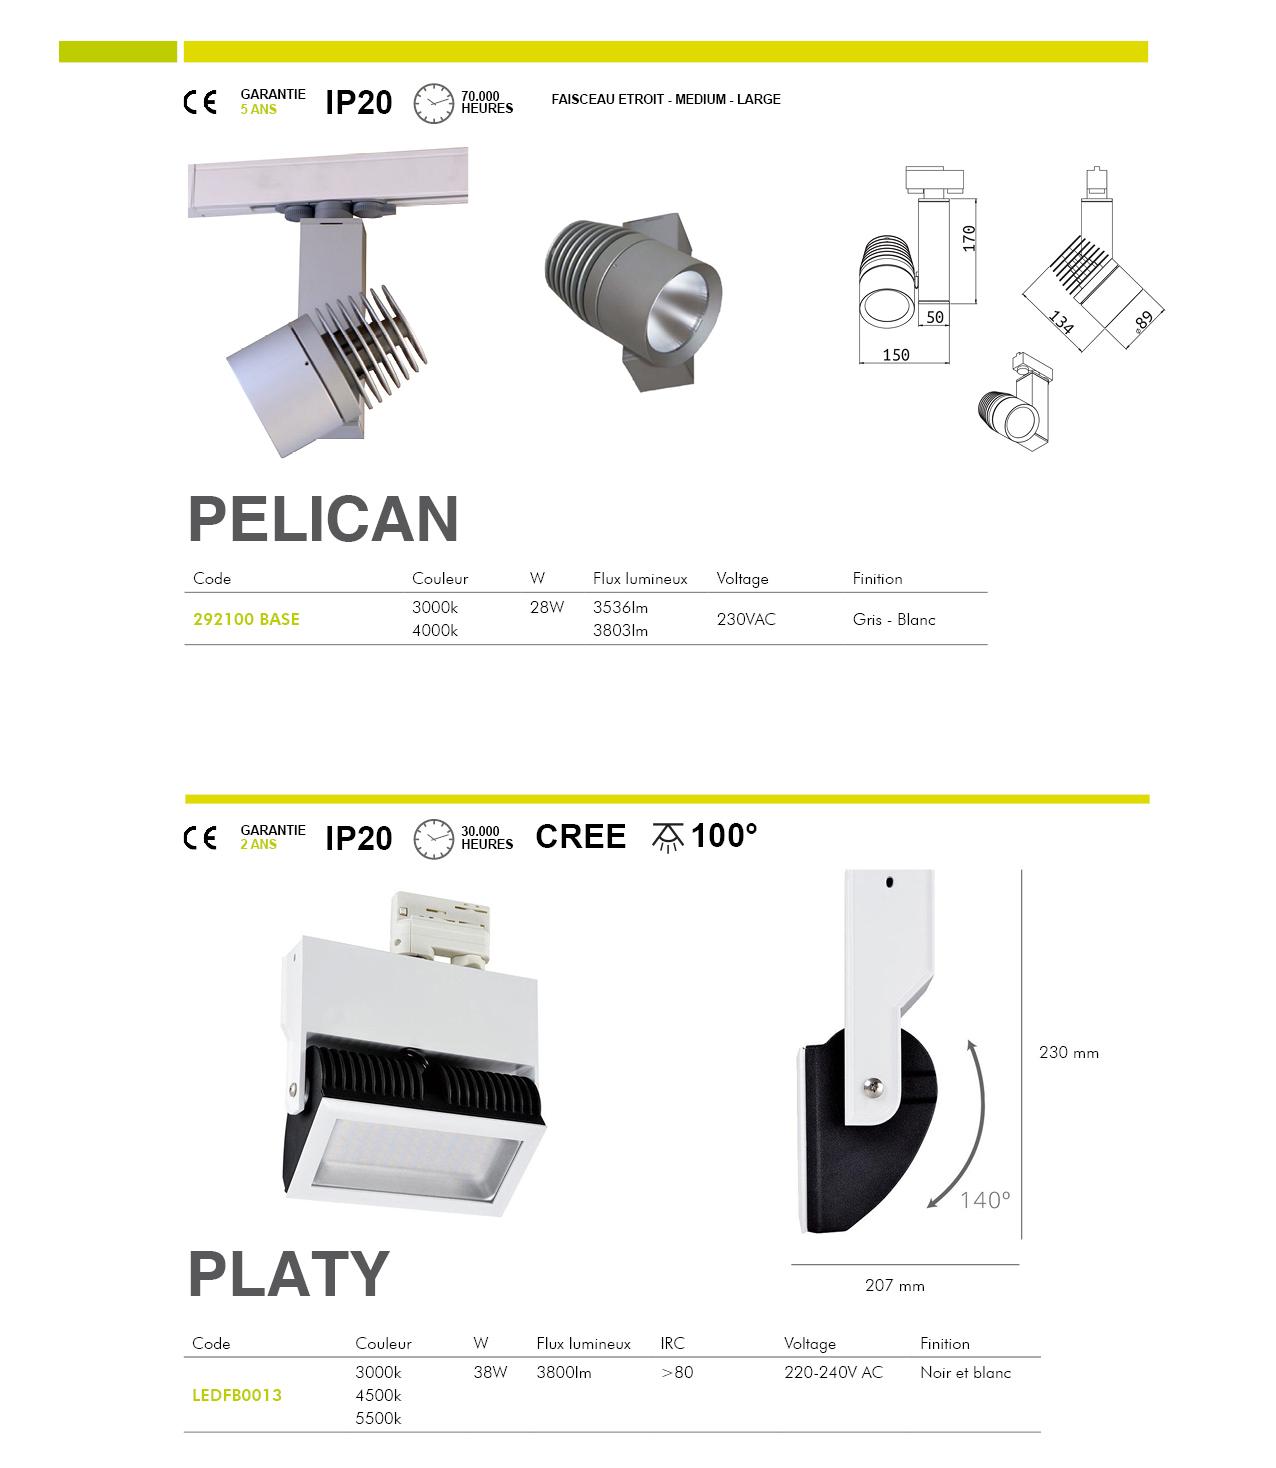 DEF-catalogue-gheury-23-06-201735